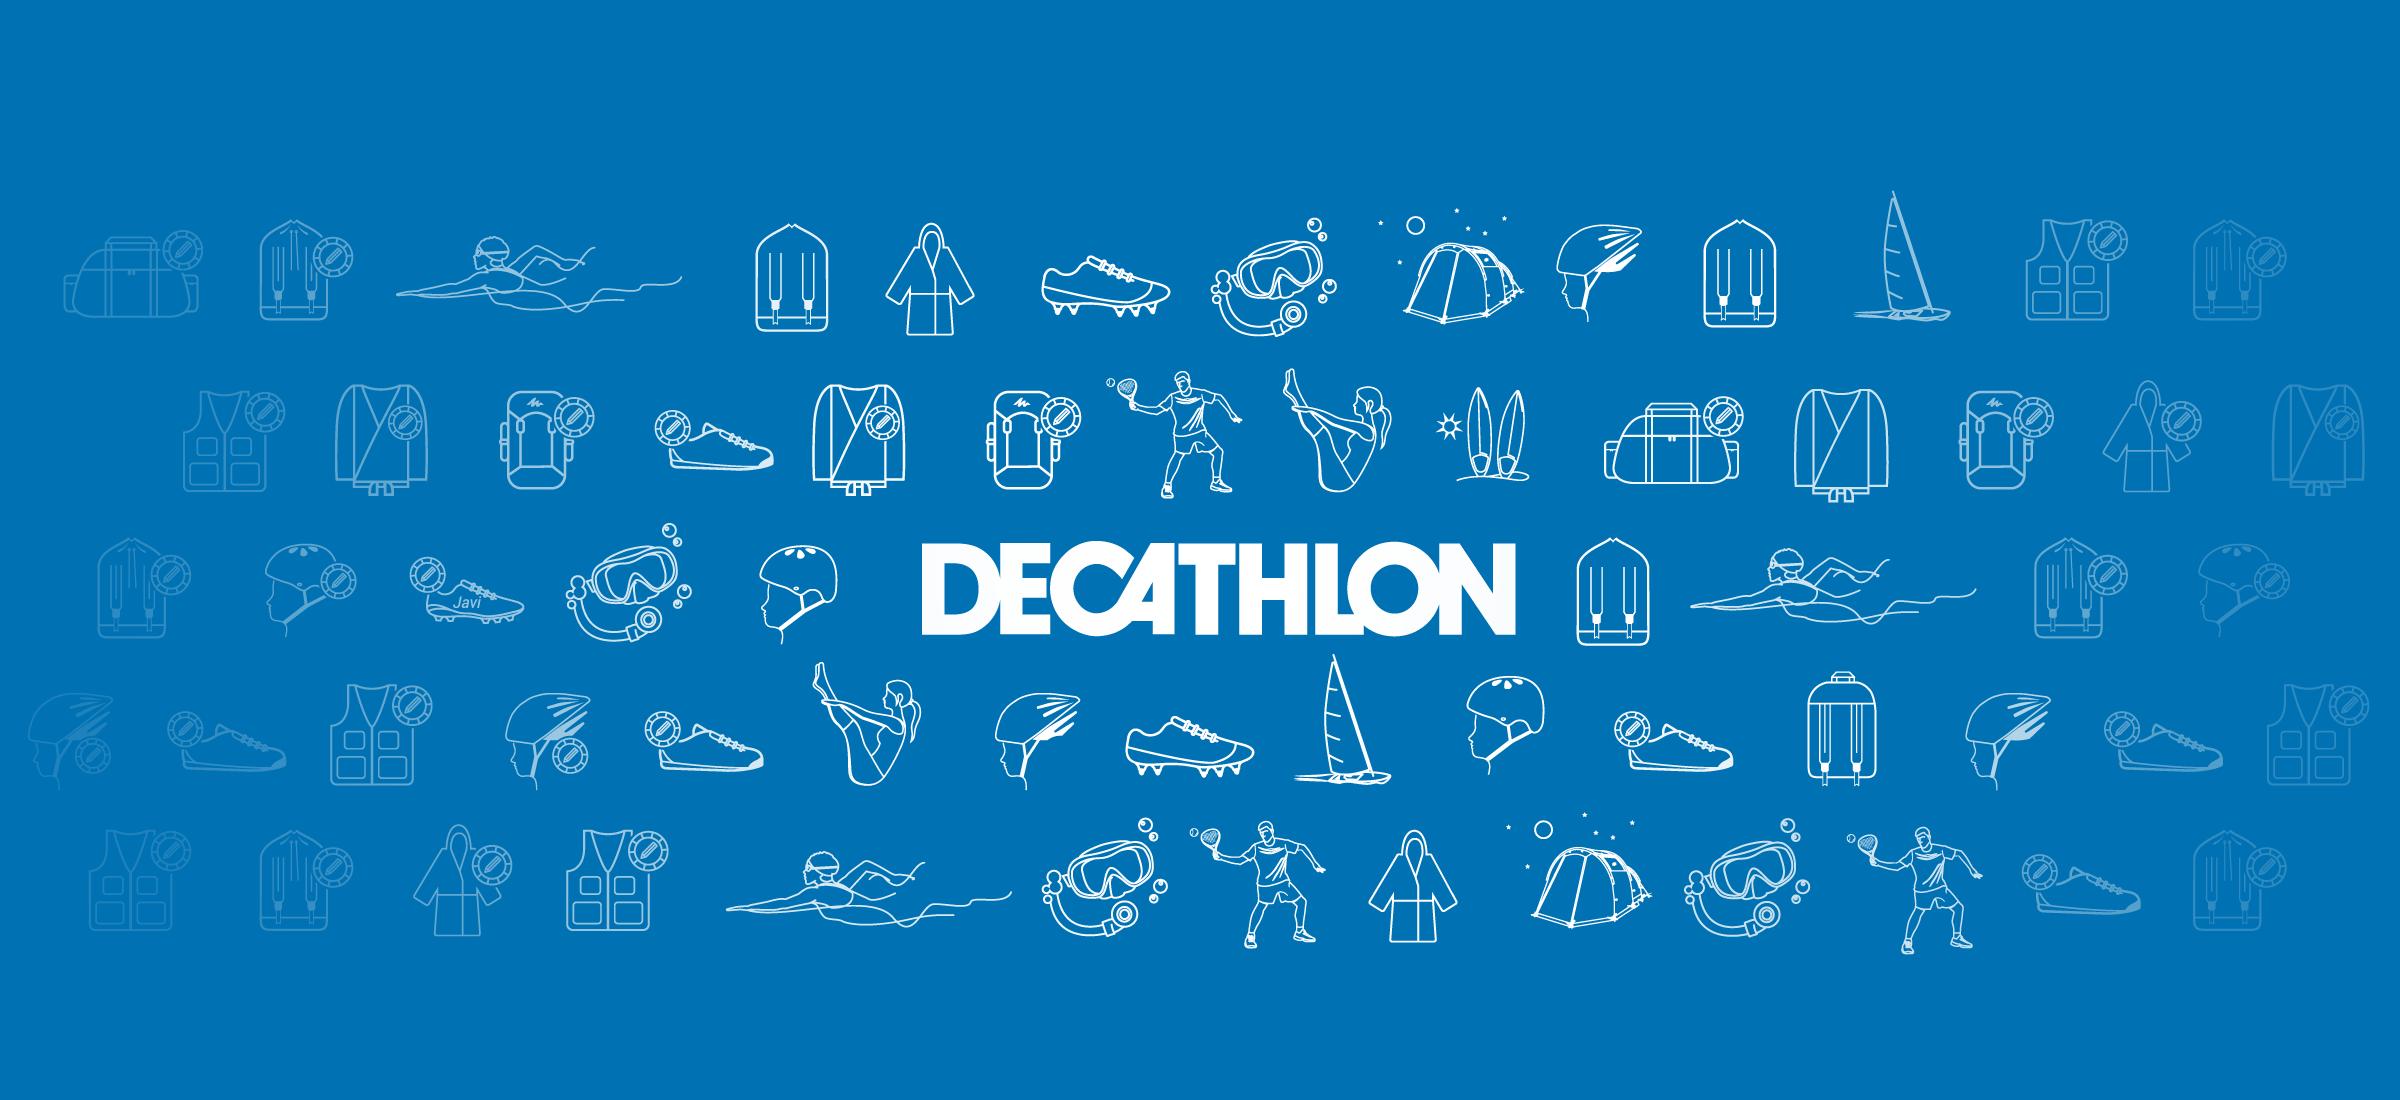 DECATHLON. End of season sale.